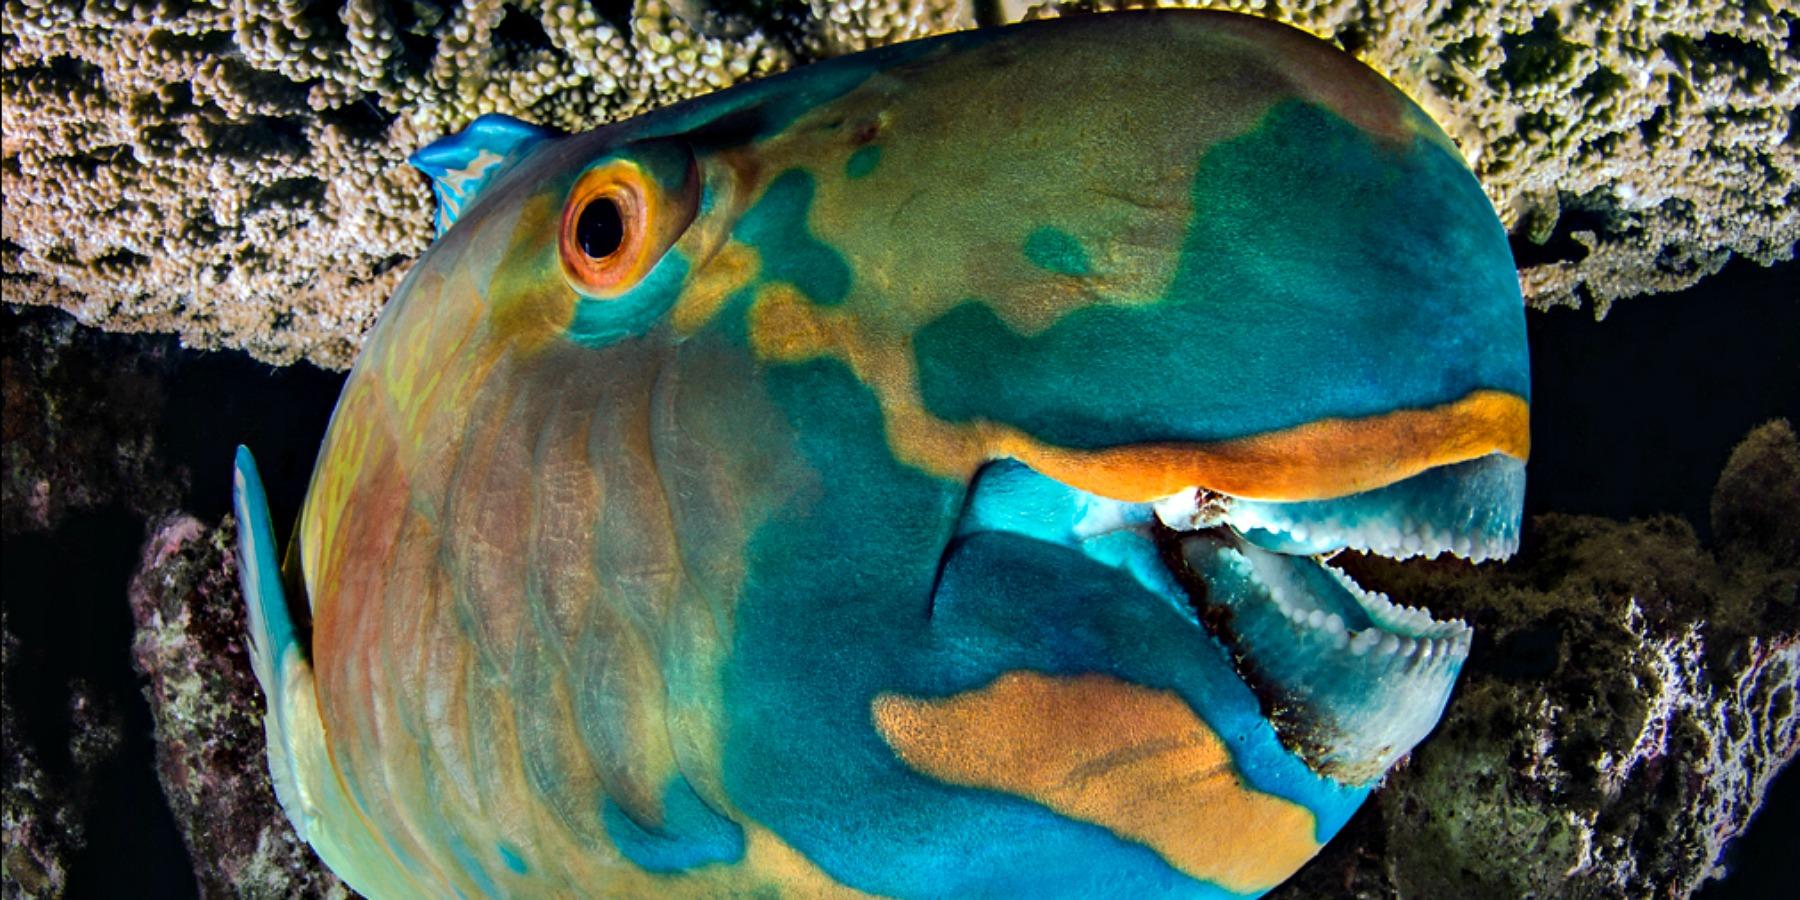 Plongeur BRONZE PORTFOLIO FMISM 2015 DOMENICO ROSCIGNO 07 1900x900 - FMISM 2015 : Domenico Roscigno, plongeur de bronze dans la catégorie portfolio